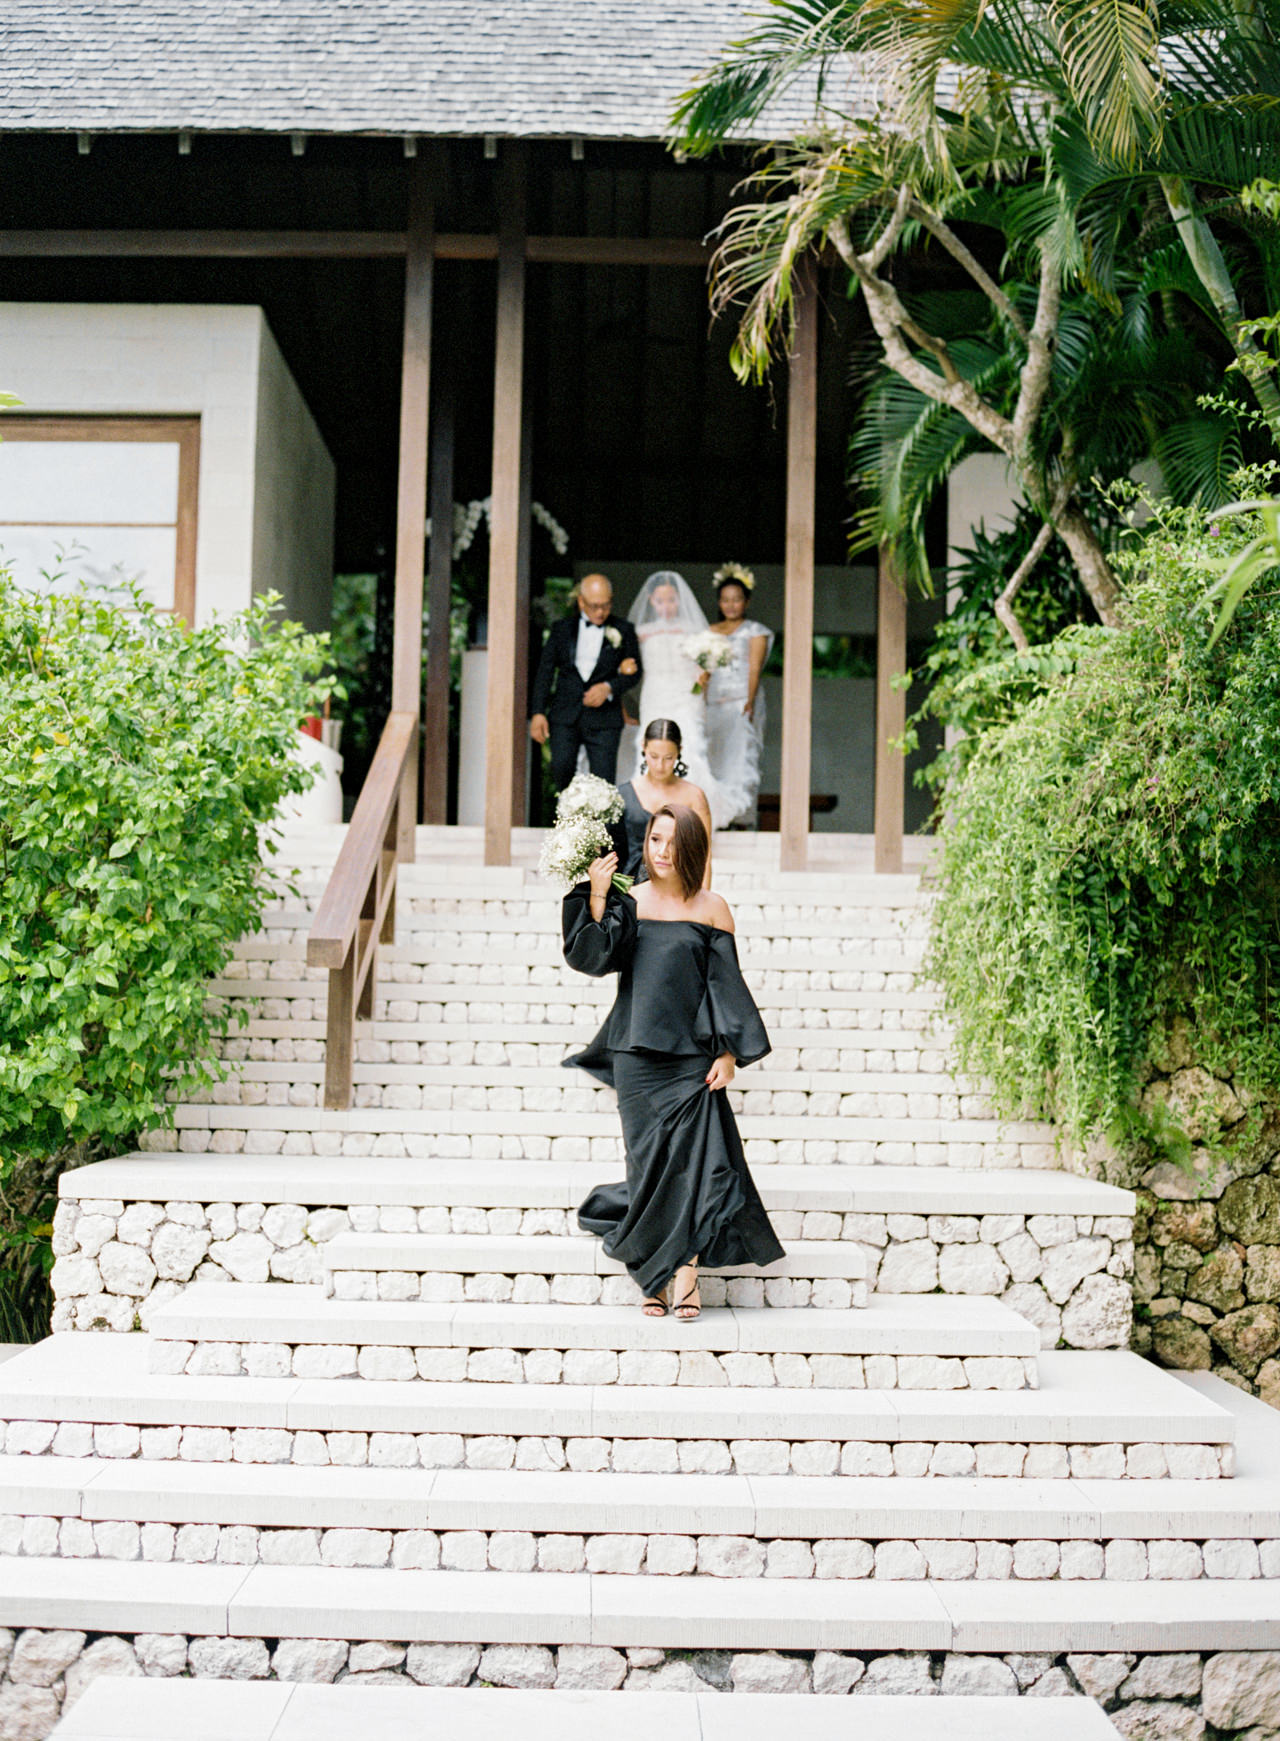 D&R: Luxury Bali Wedding Reception at The Glass House by Tirtha 9